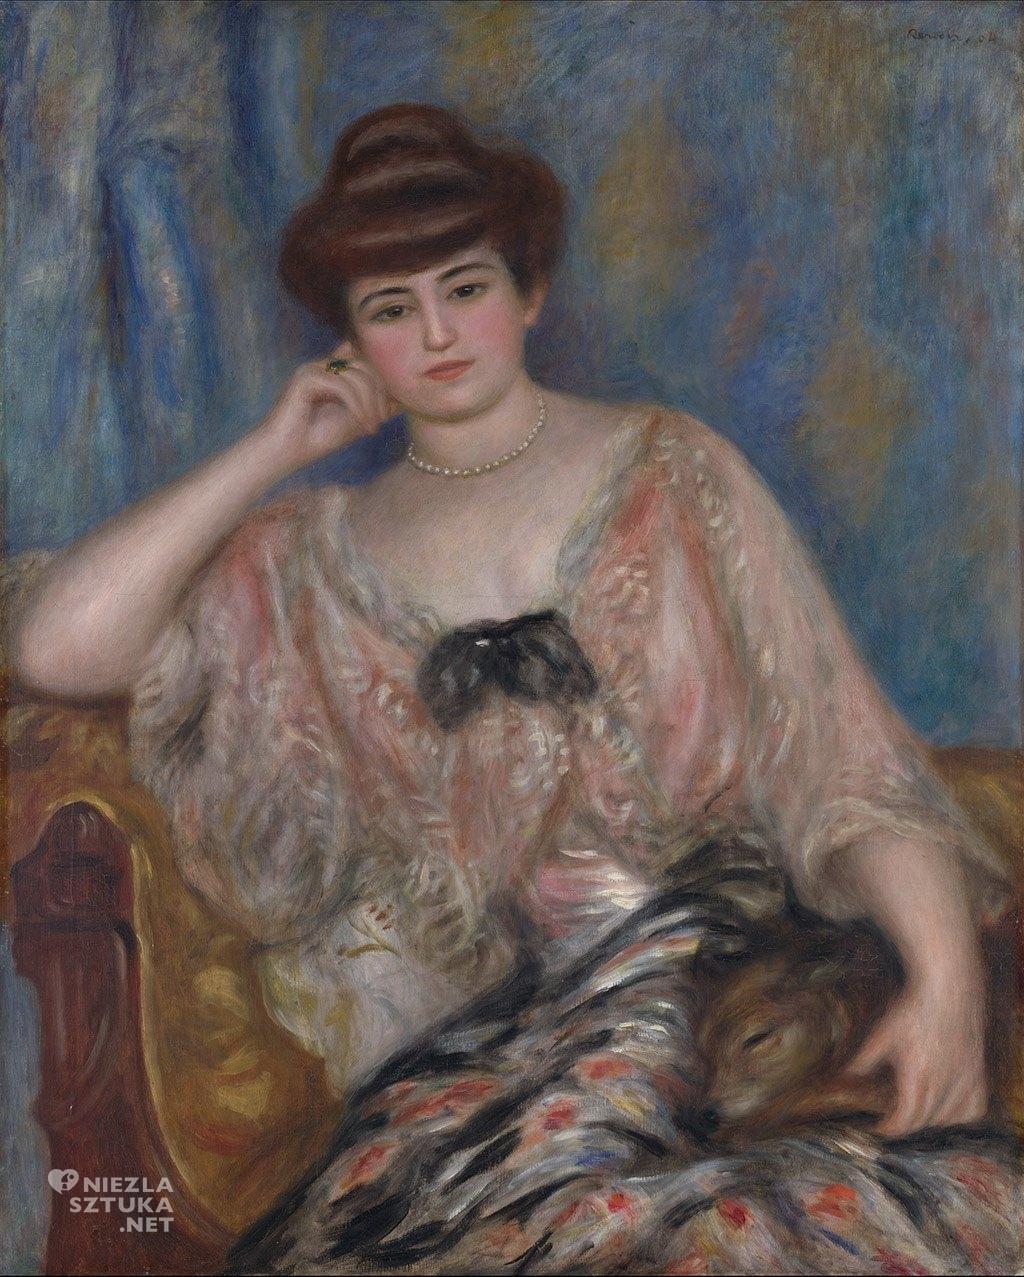 Pierre-Auguste Renoir <em>Misia Sert</em> | 1904, fot.: theredlist.com